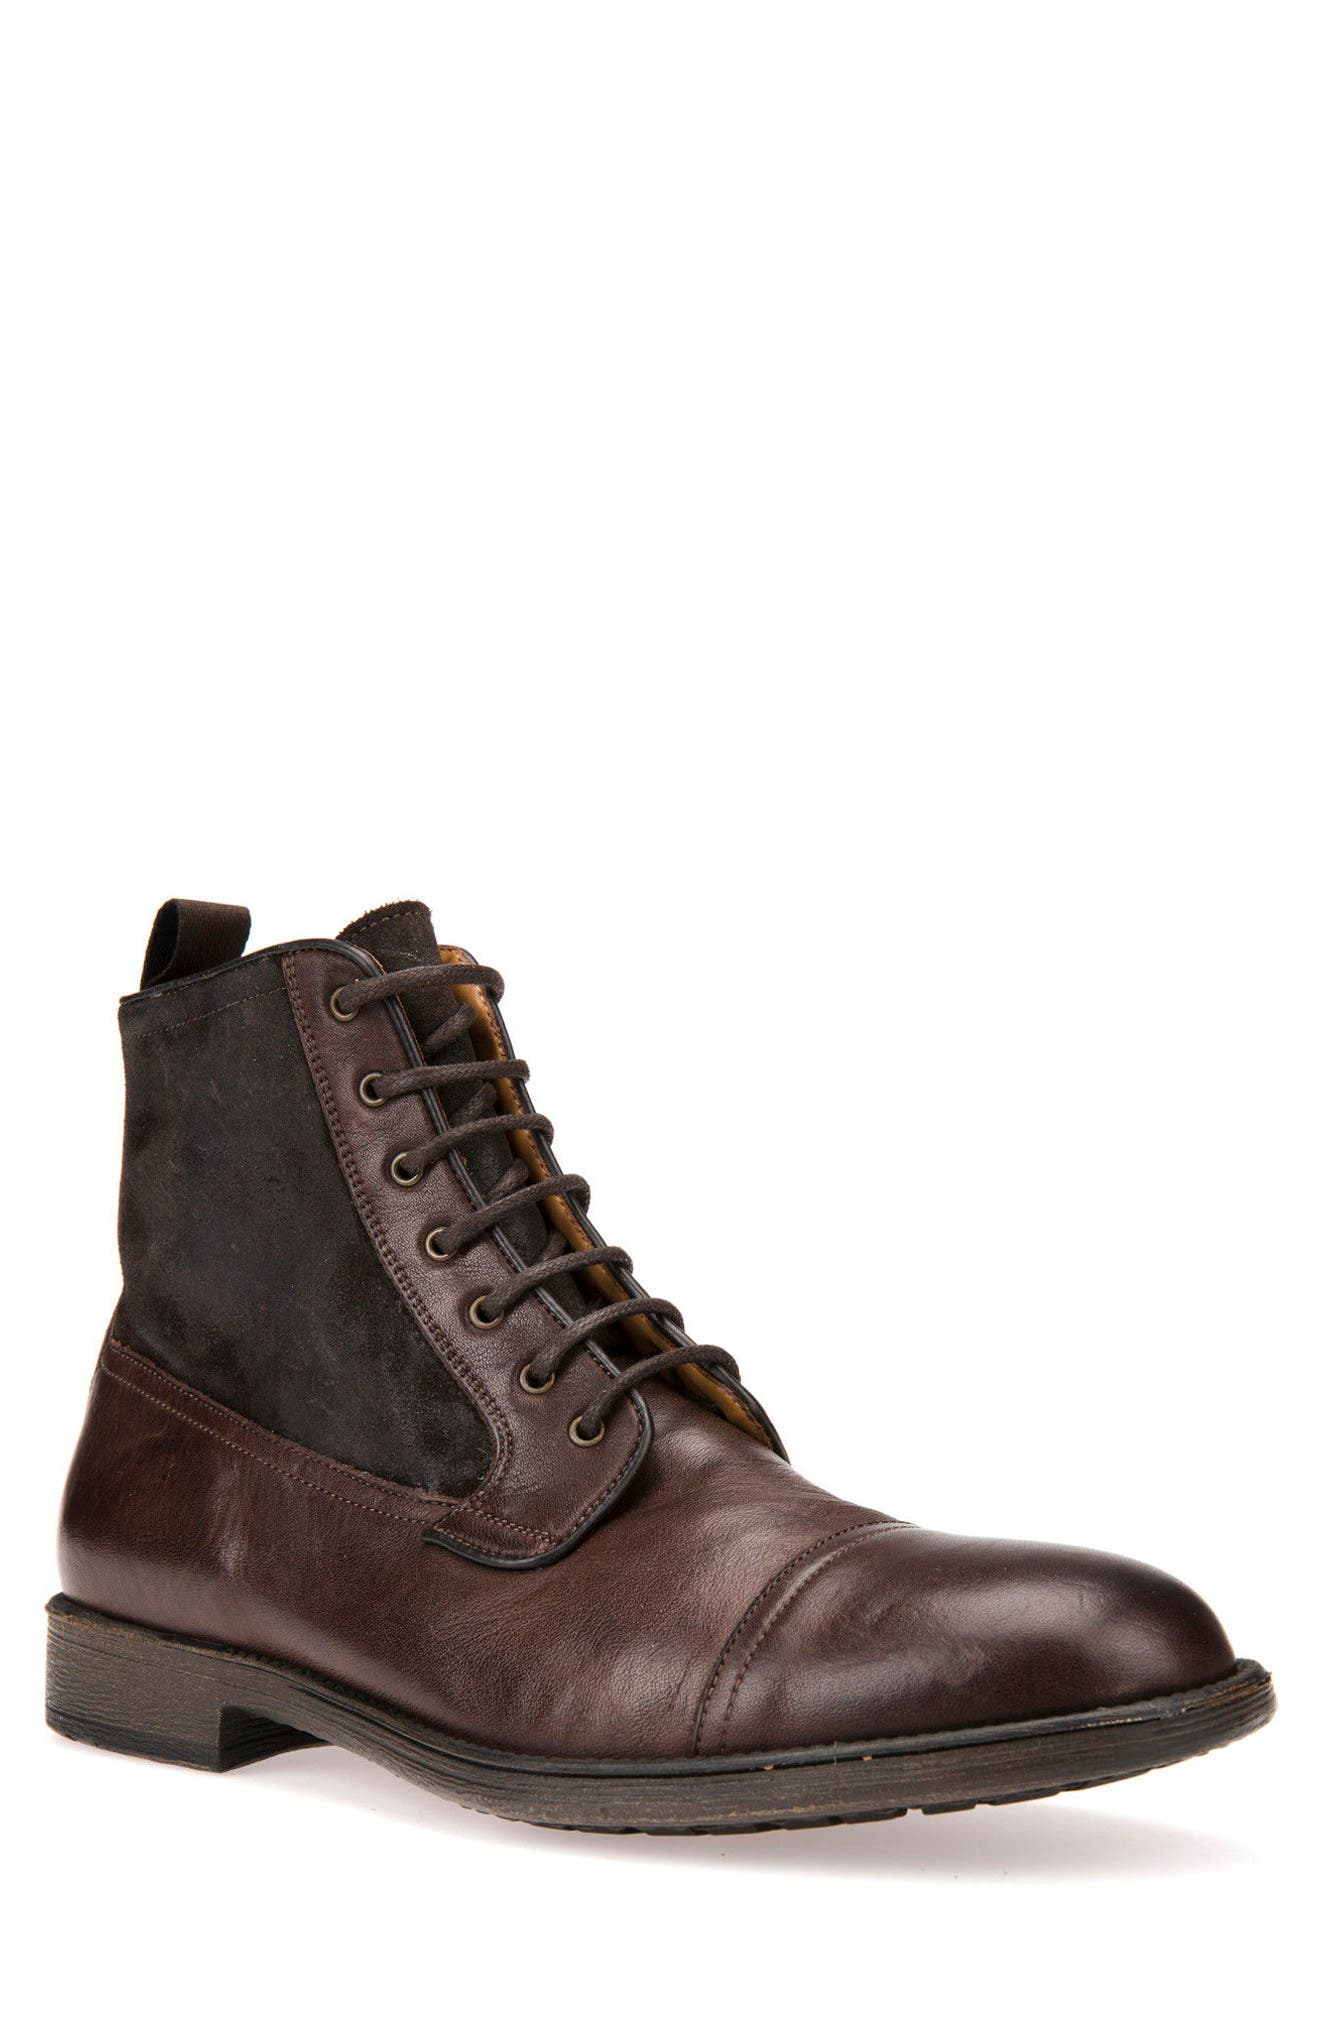 Geox Jaylon 12 Cap-Toe Boot (Men)